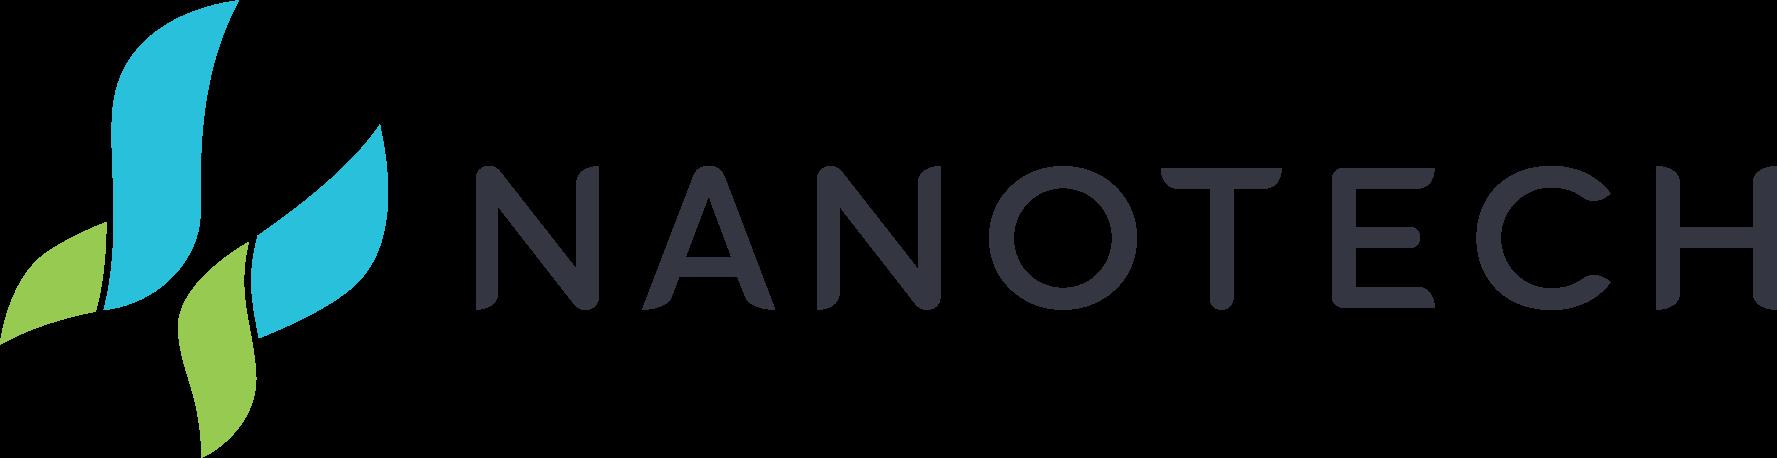 Nanotech Launches LumaChrome Colour-shifting Film for Product Authentication